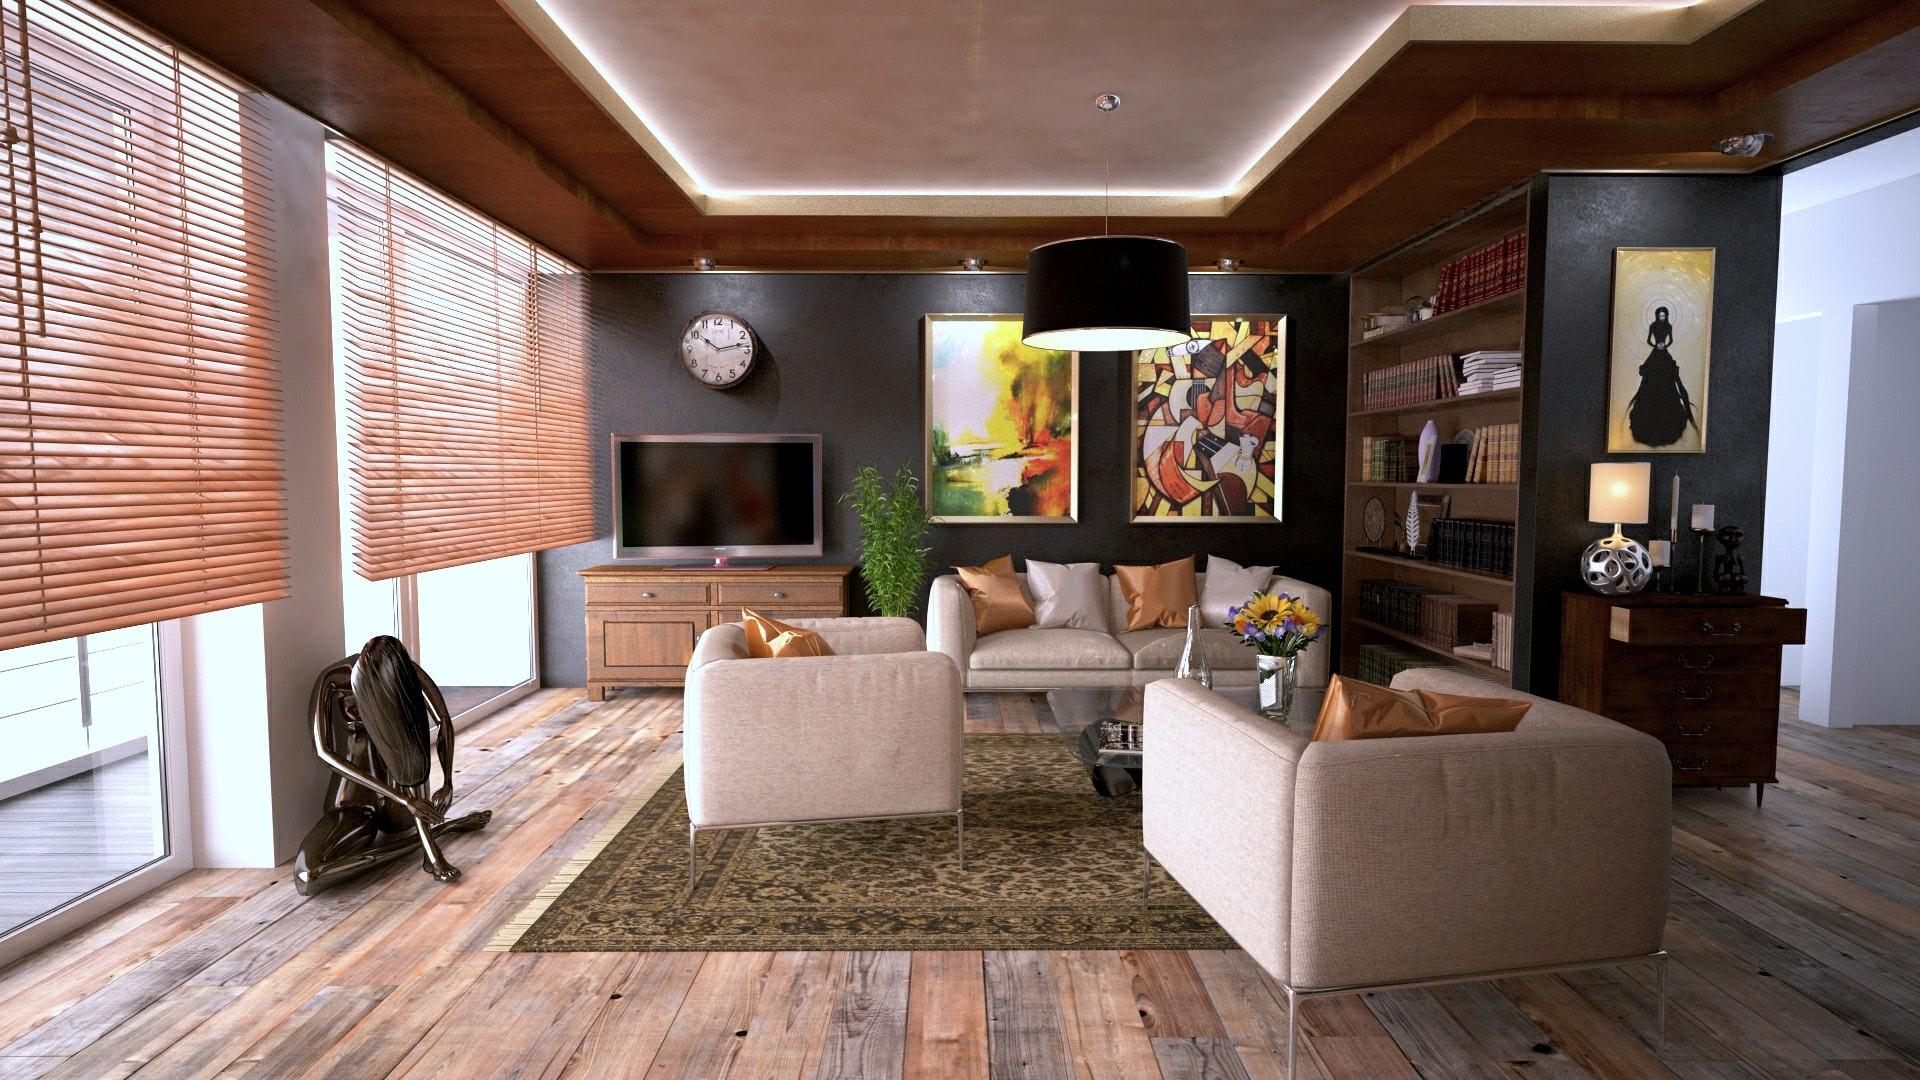 apartment-architecture-art-276724.jpg